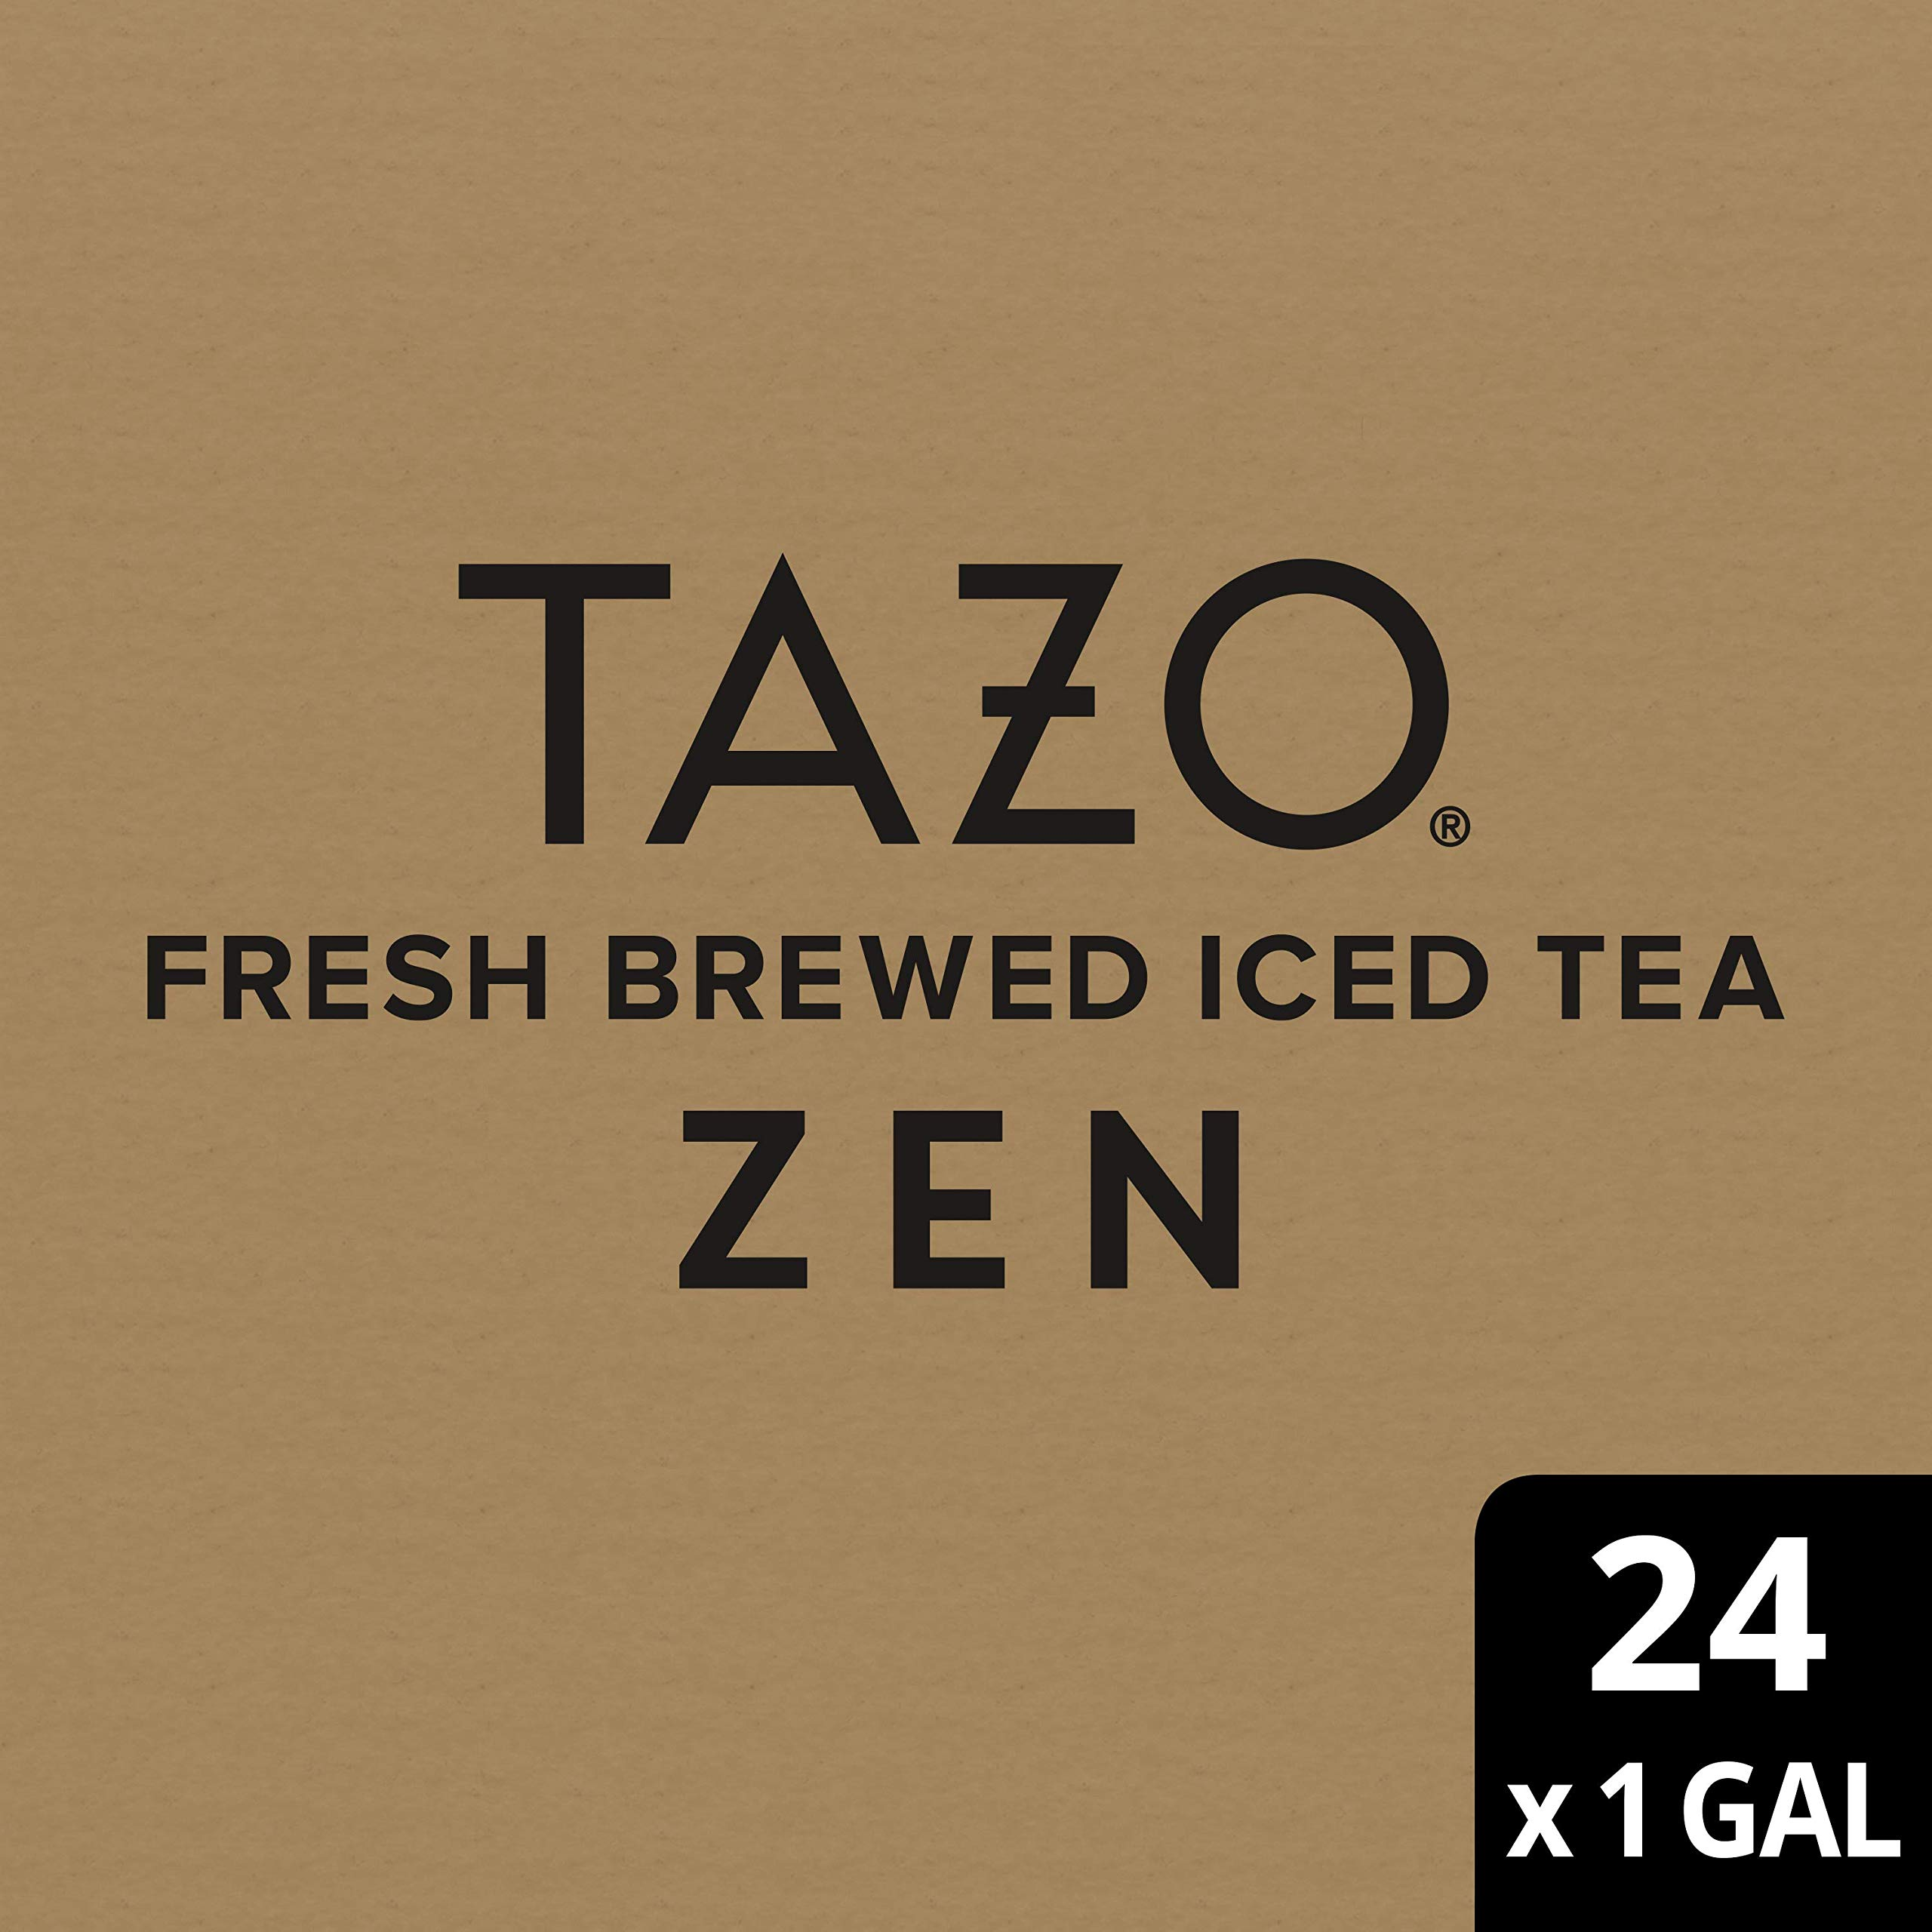 Tazo Zen Green Unsweetened Fresh Brewed Iced Tea Non GMO, 1 gallon, Pack of 24 by TAZO